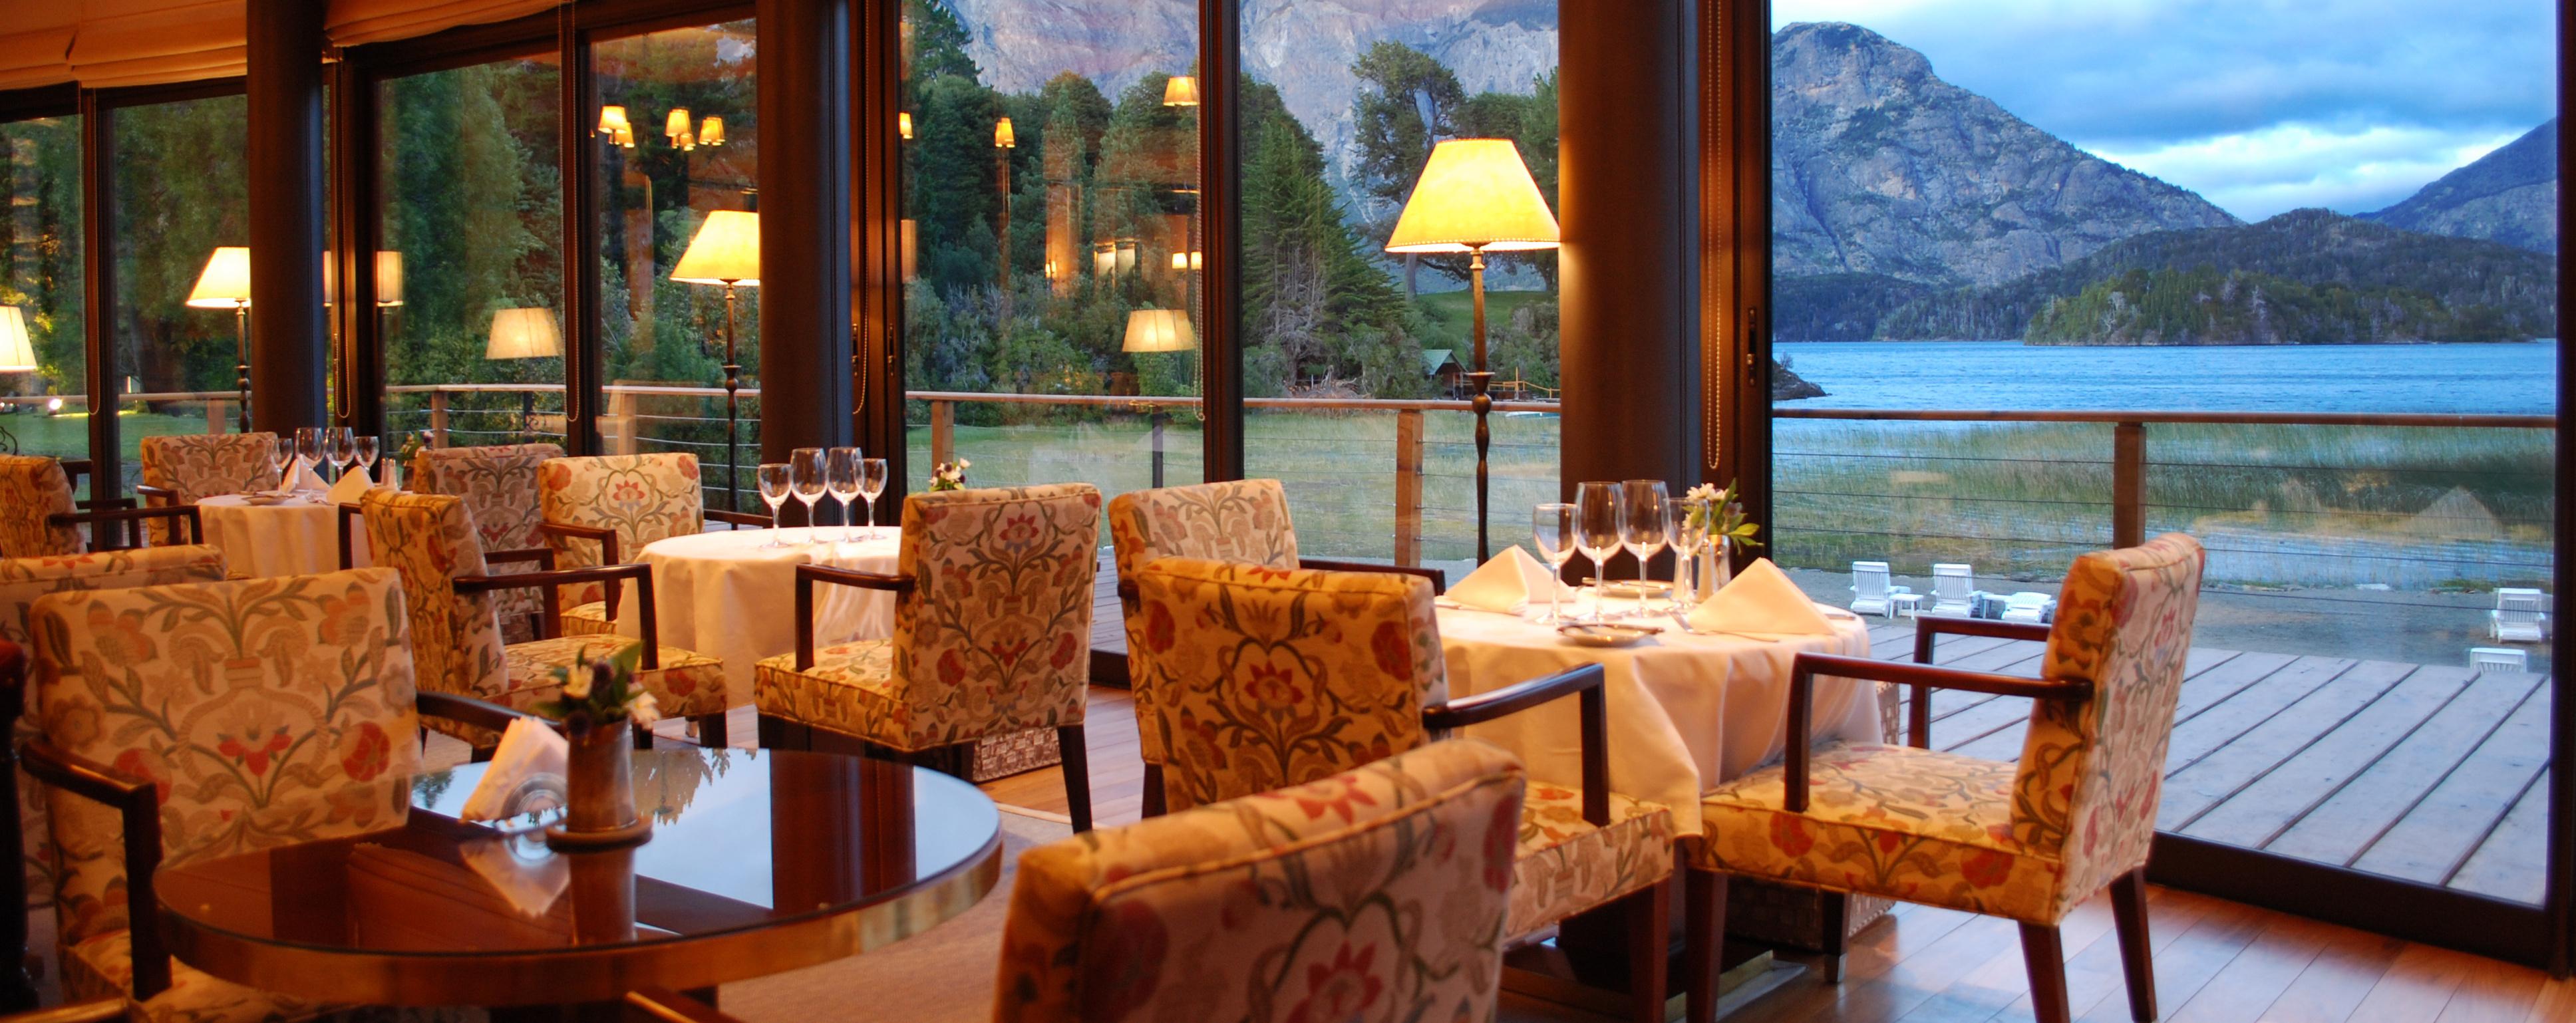 llao-llao-hotel-restaurant-view